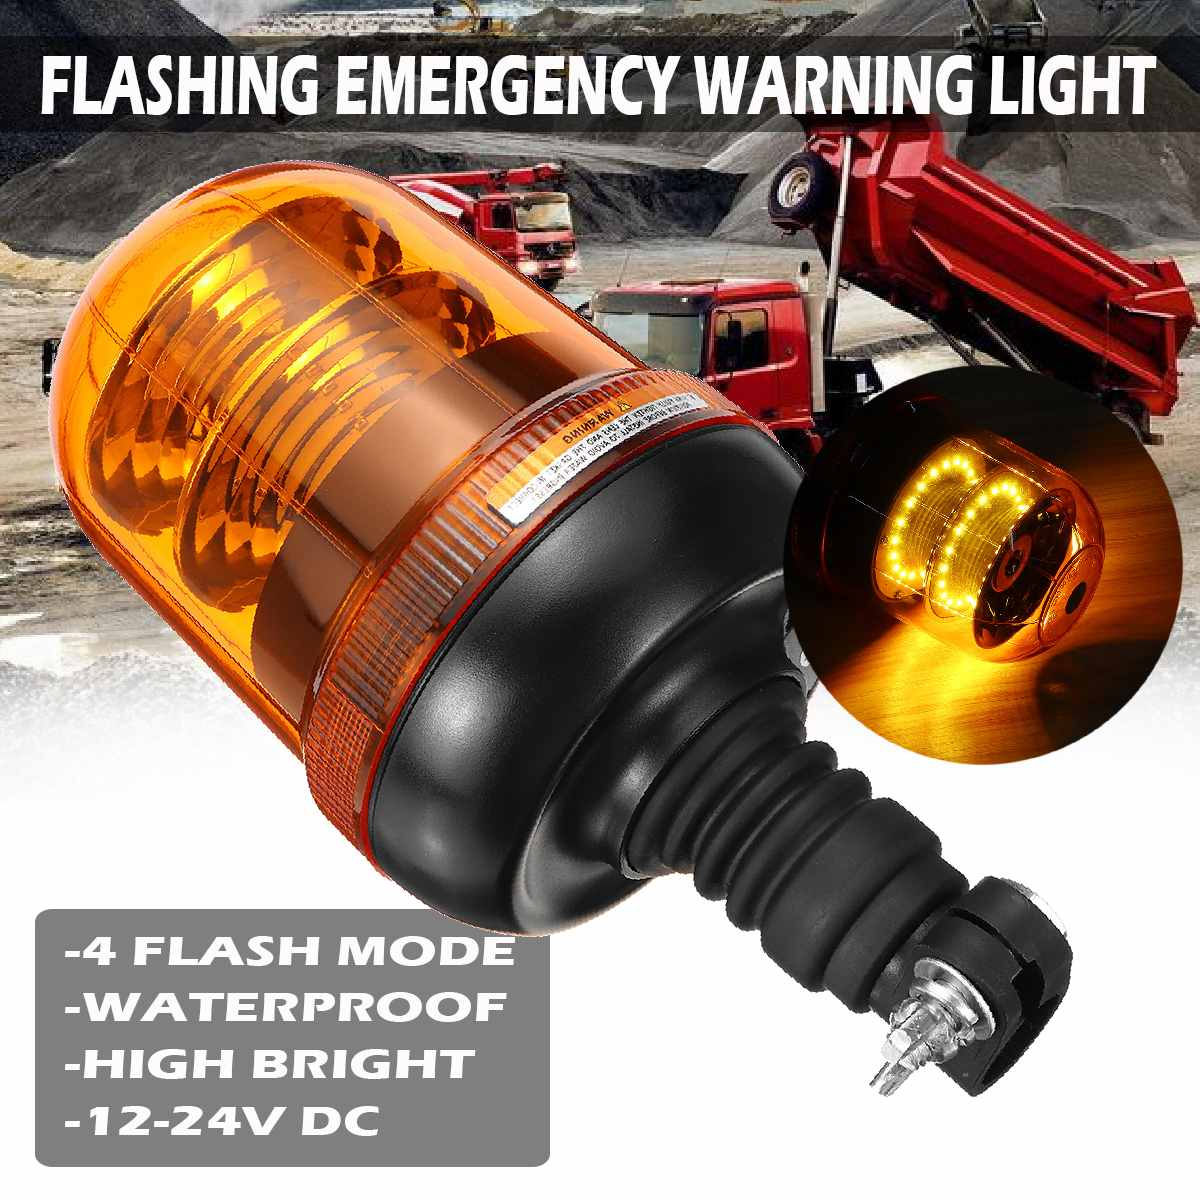 Amber Beacon Working light for Tractor Super Bright Flashing Emergency Warning Light 40 Led car truck strobe warning light E9